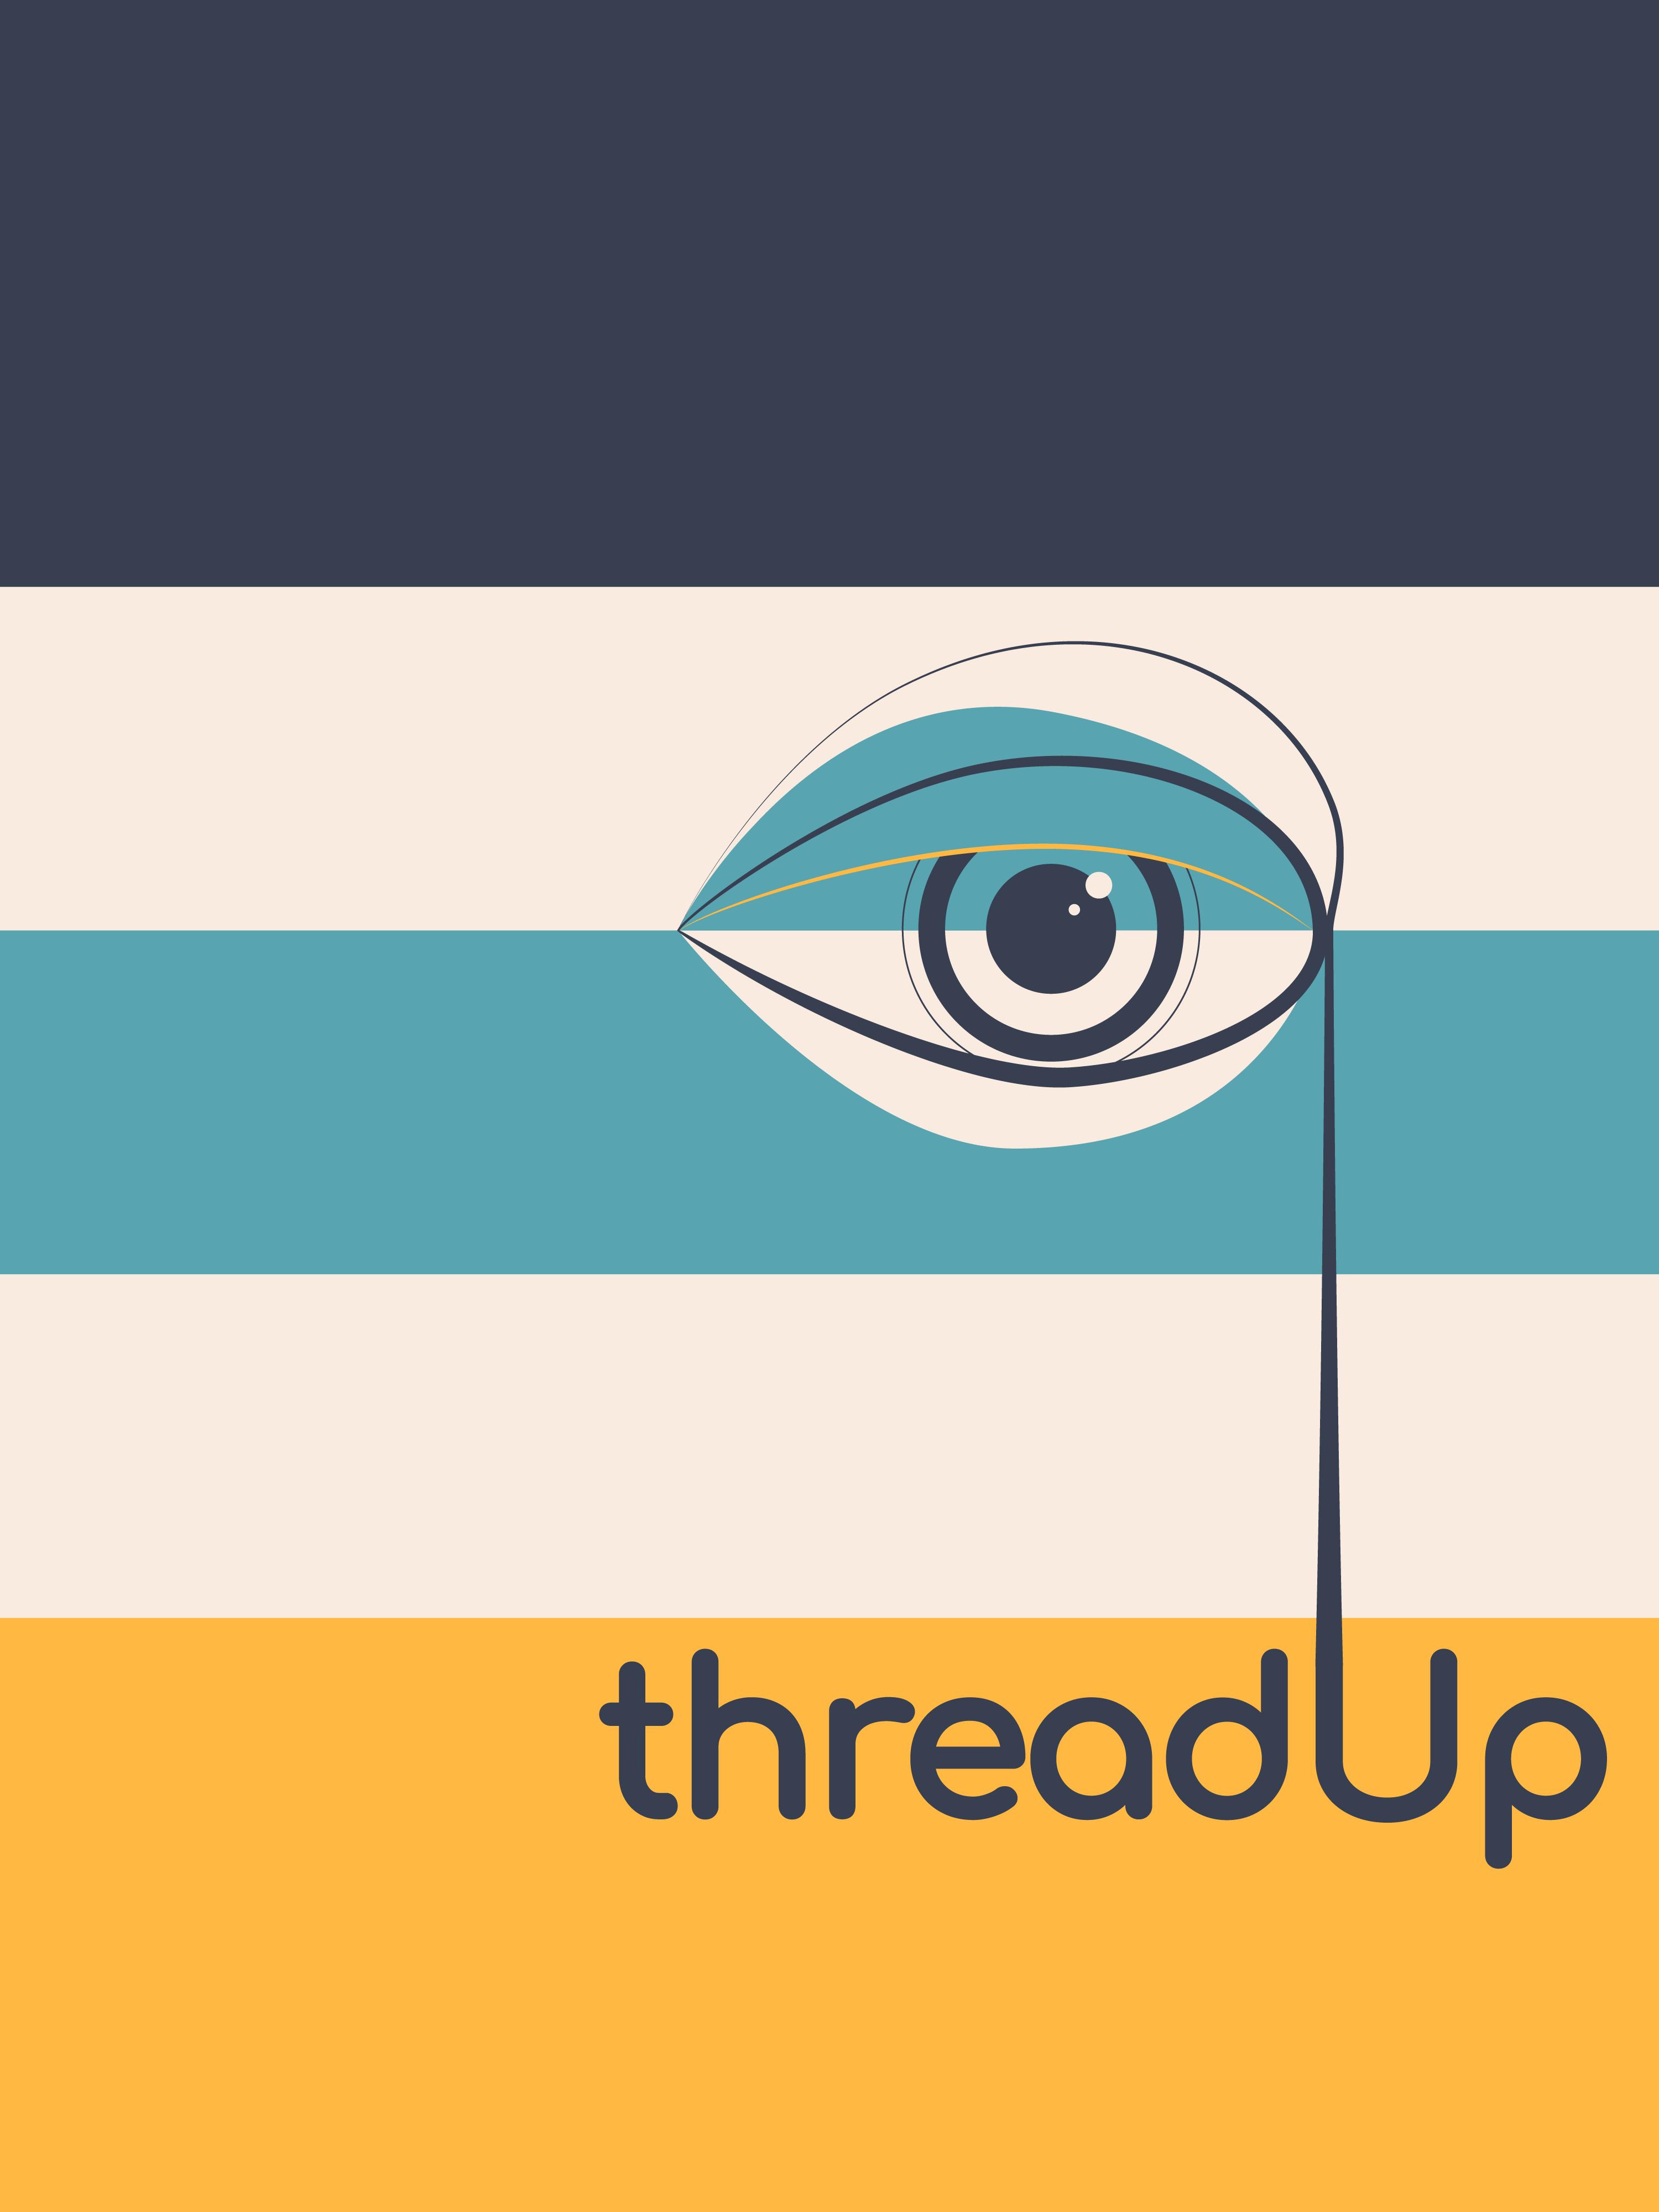 threadUp-LOGO-003